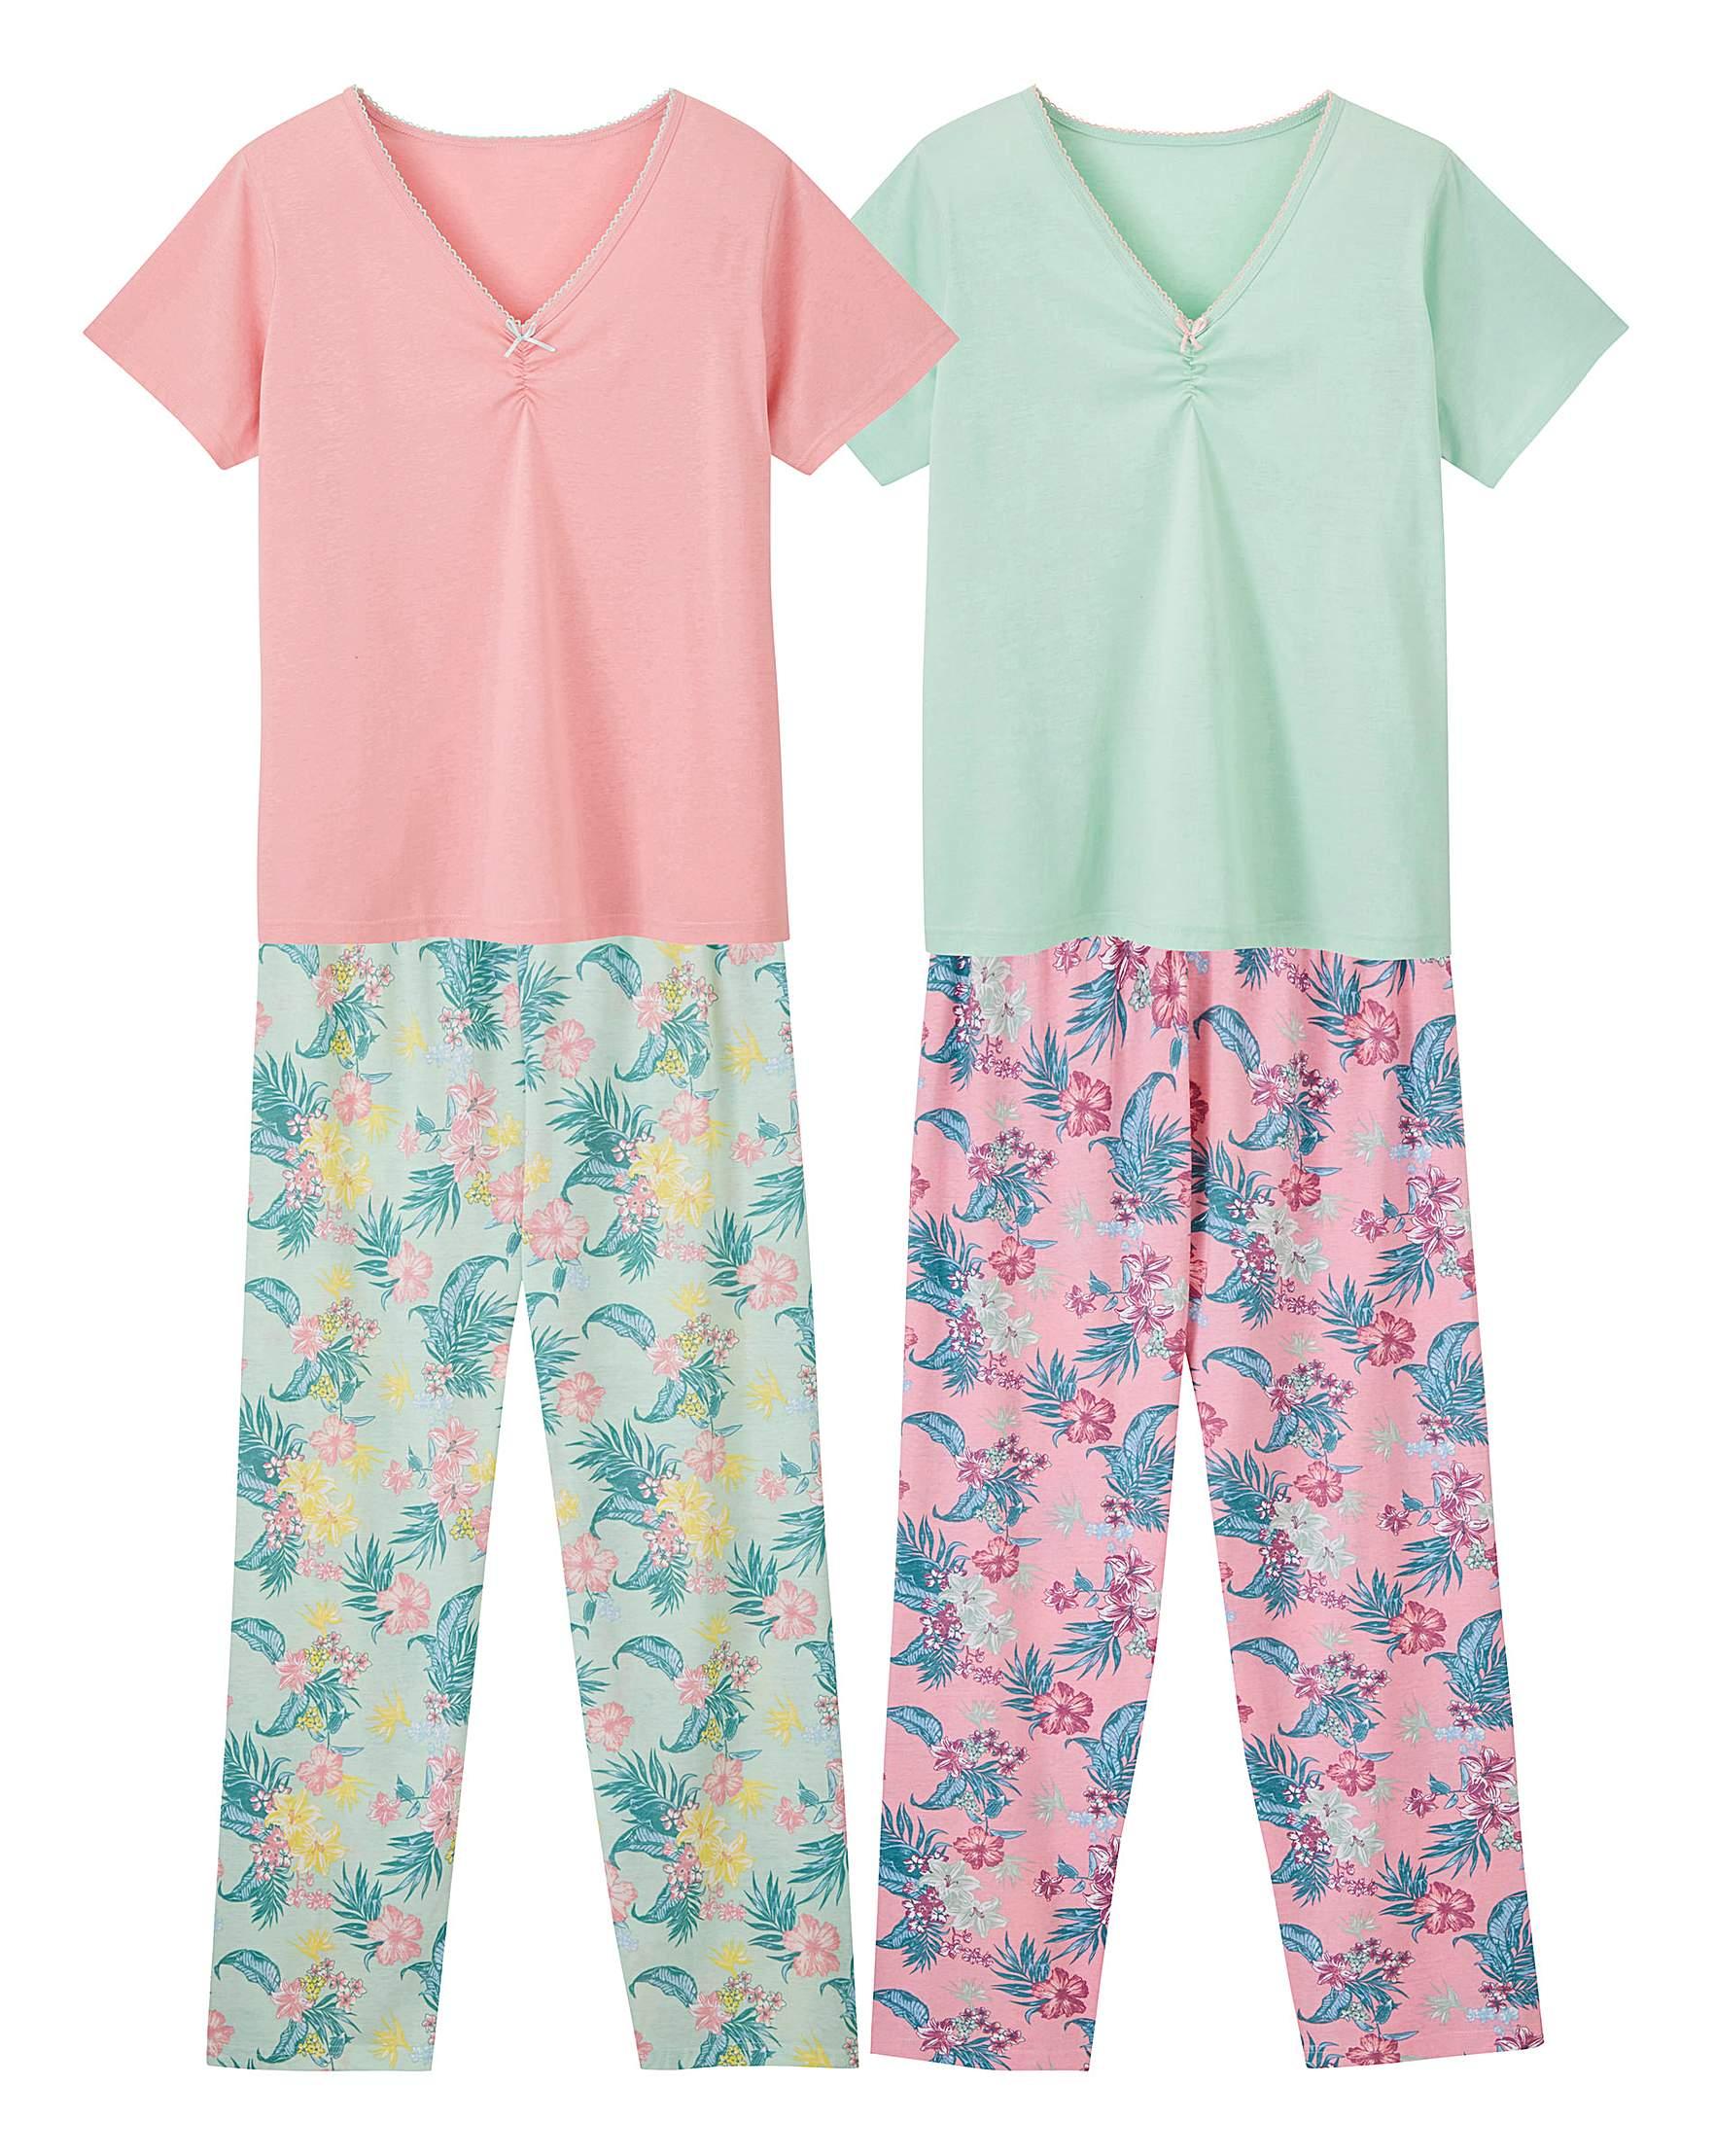 c88c8e0e642 Pretty Secrets 2pk Short Sleeve PJ Sets